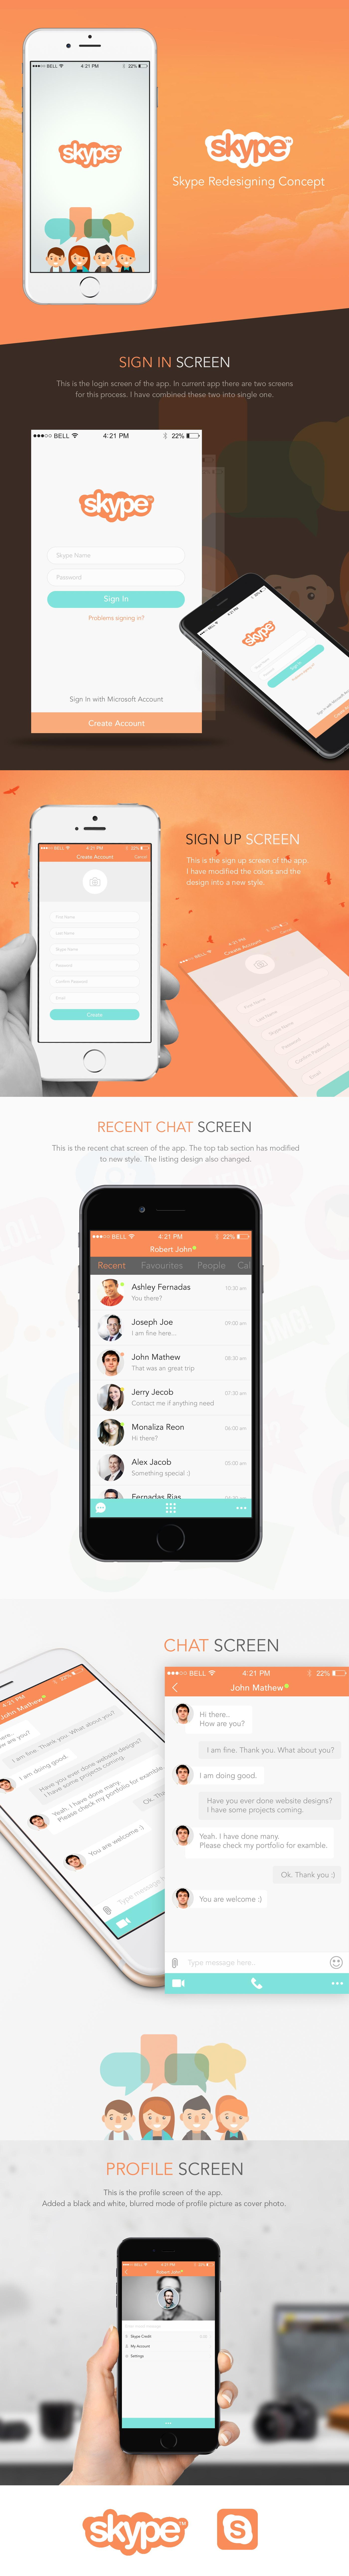 Skype redesigning Redesigning concept Skype Redesigning Concept iOS App app ios Mobile app